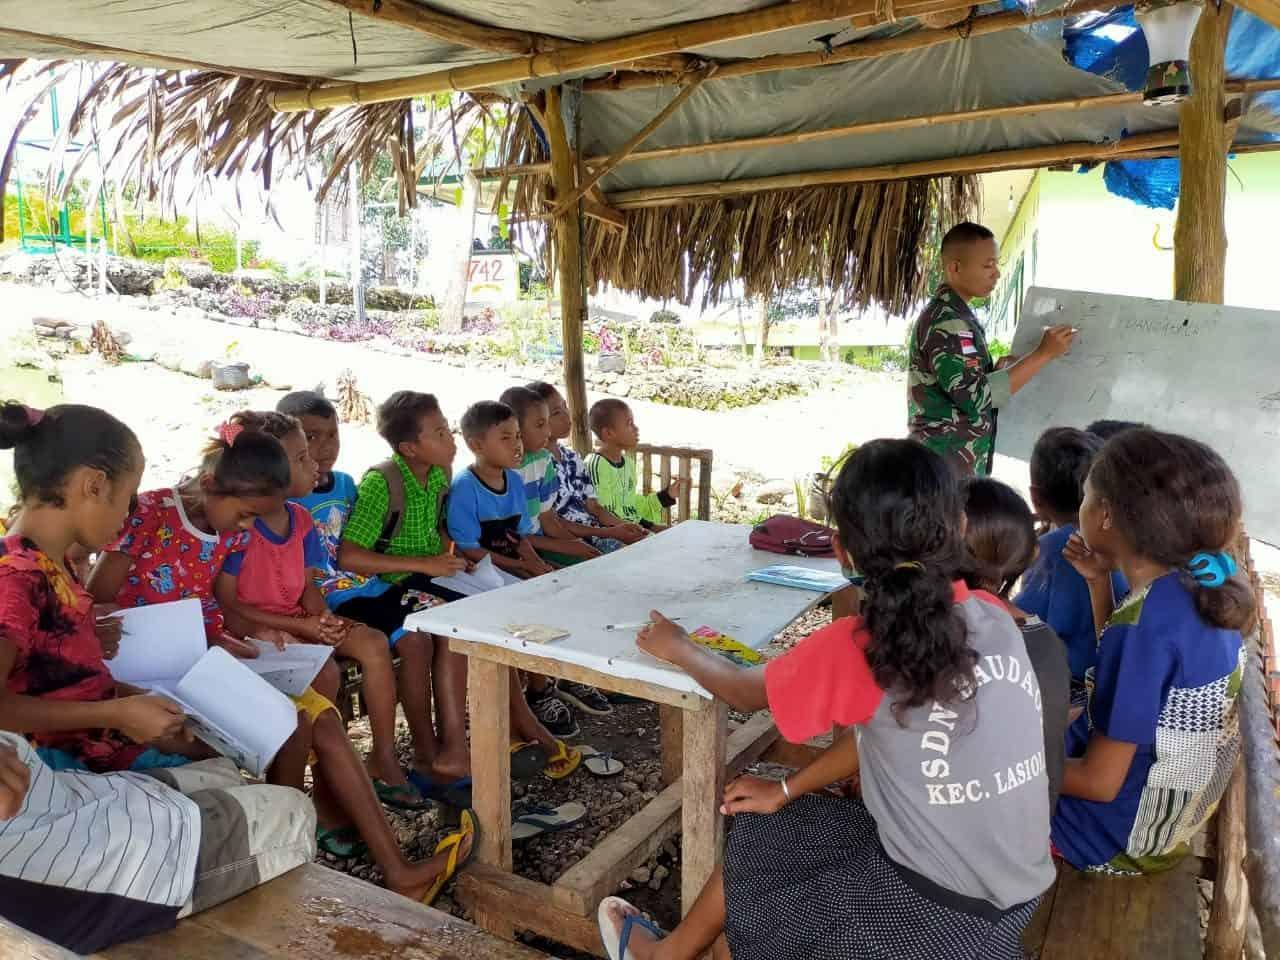 Satgas Yonif 742 Berikan Pelajaran Tambahan Kepada Anak Perbatasan